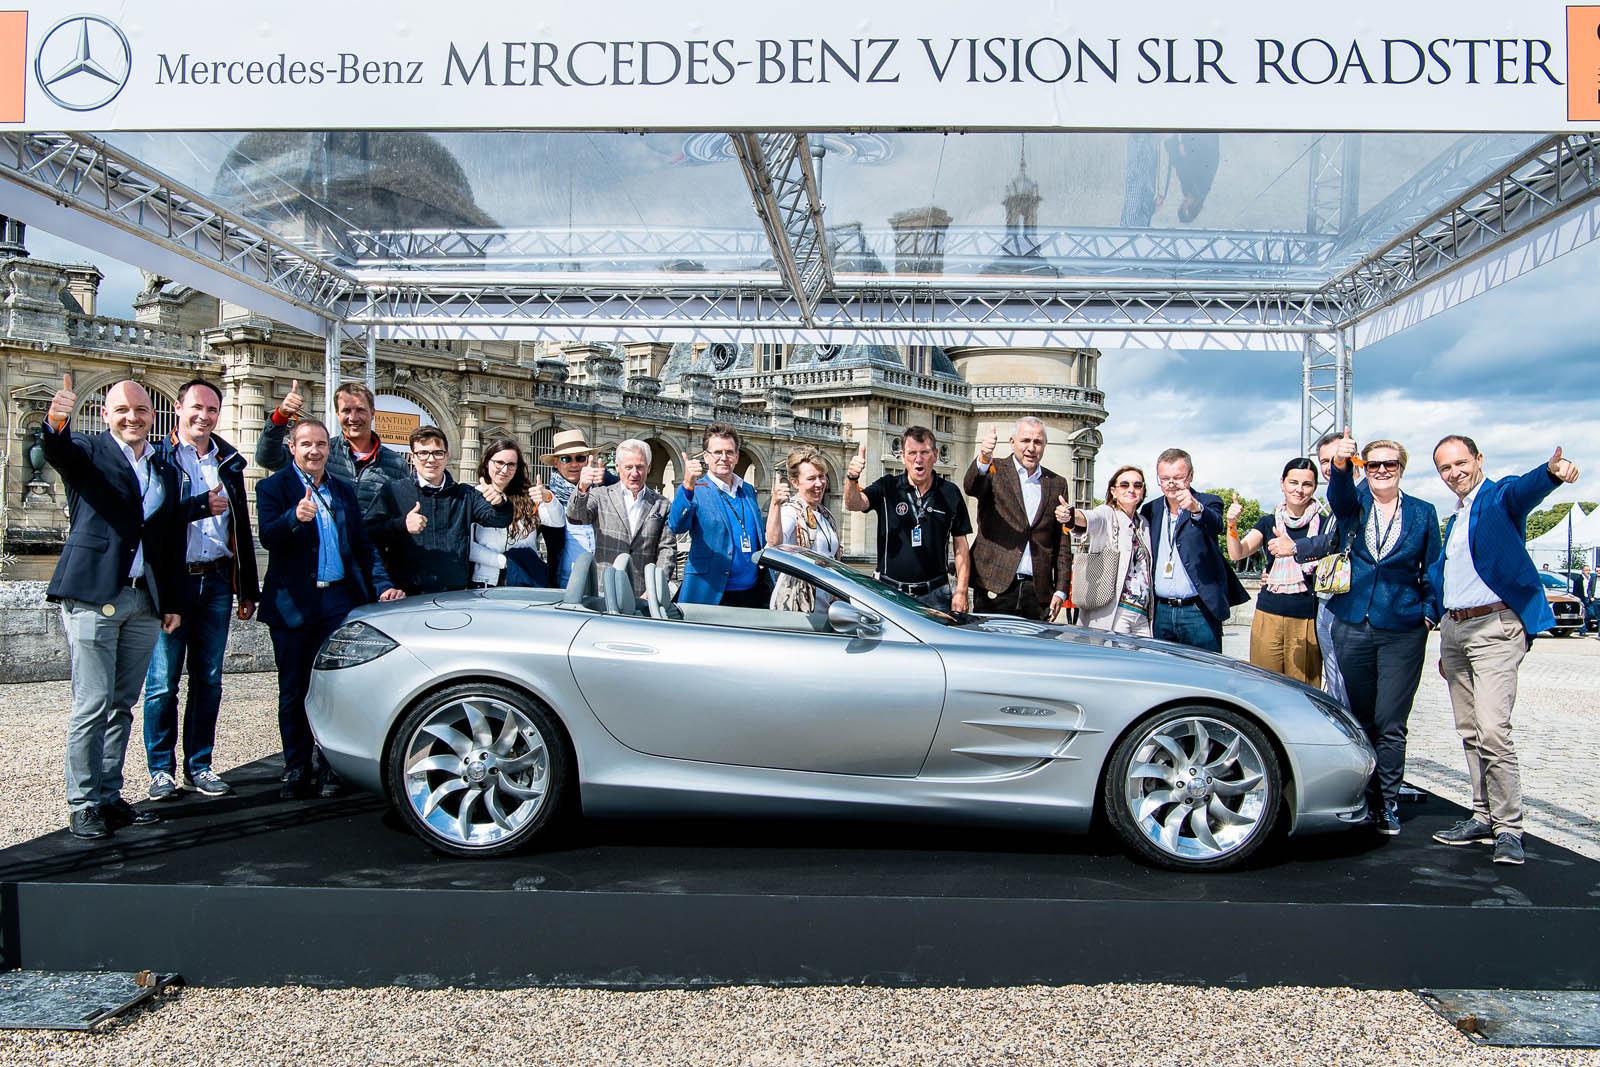 Own A Mercedes-Benz SLR McLaren? Join The Club